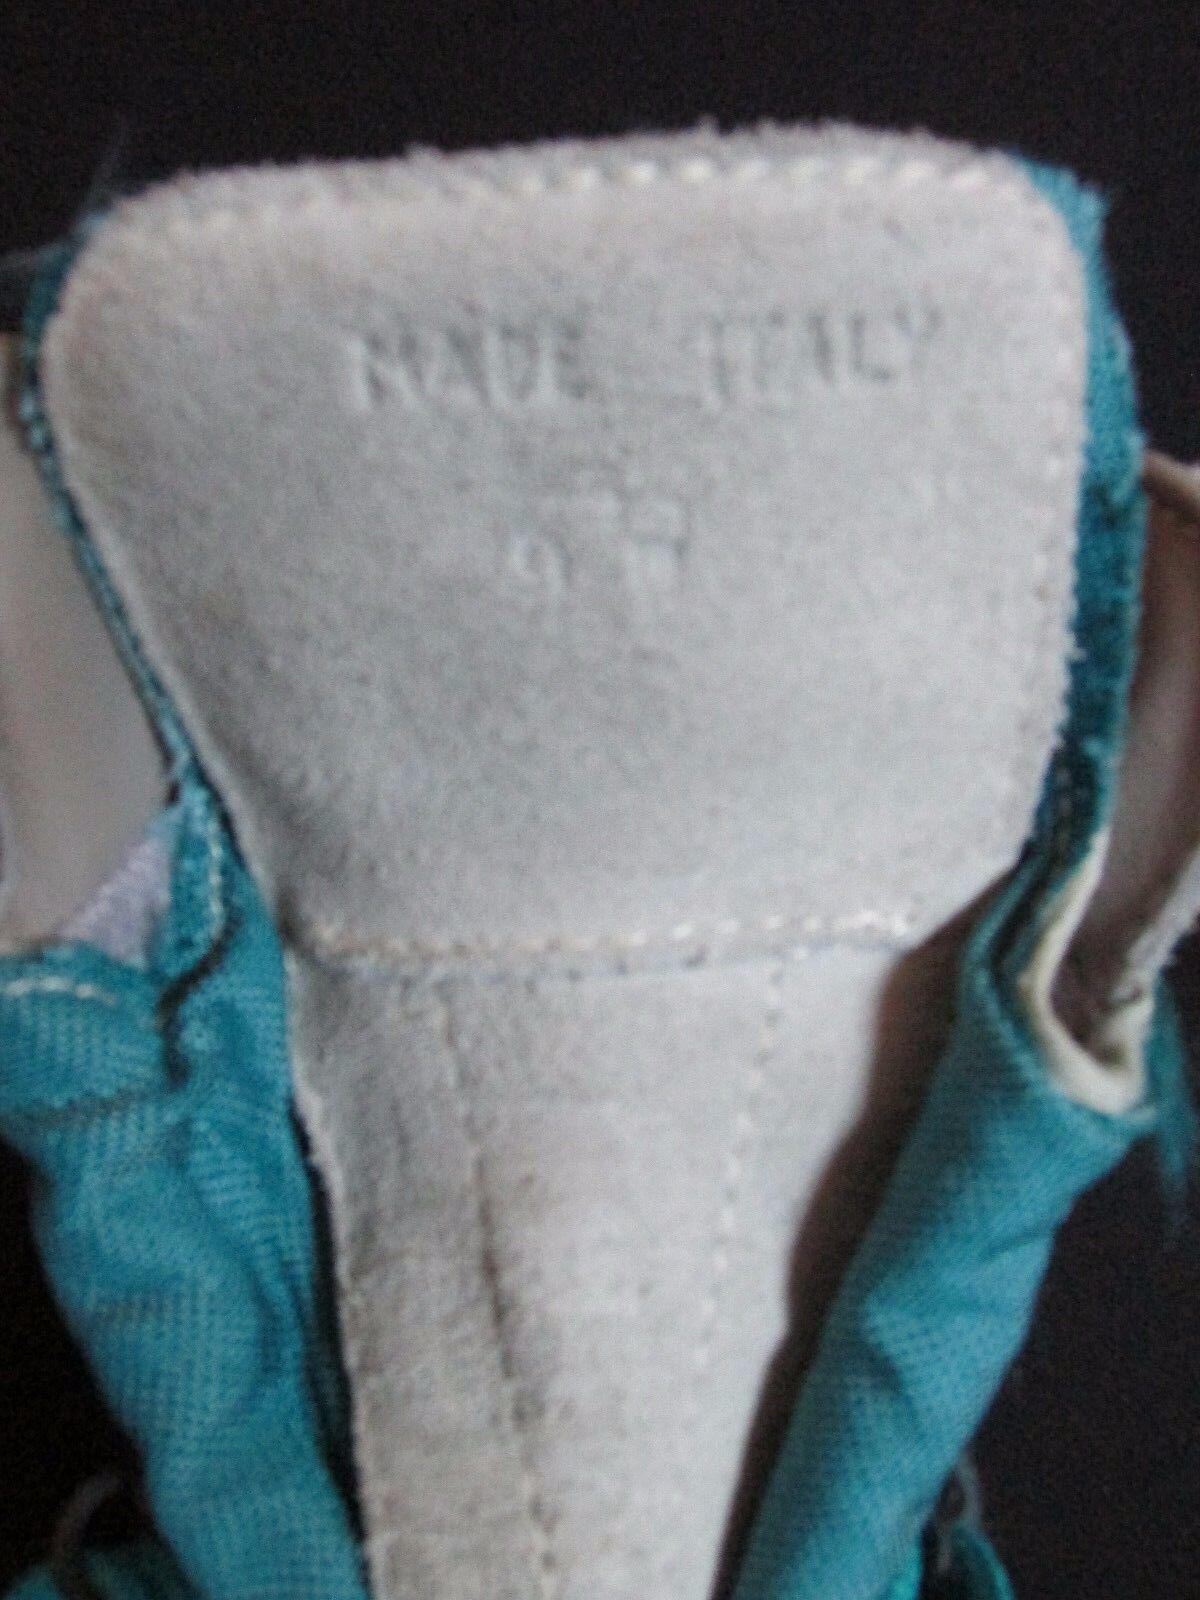 Cabela's Cabela's Cabela's Vintage Italia Gore-Tex Impermeable Bota De Senderismo gris Turquesa Gamuza US 9M 47117e